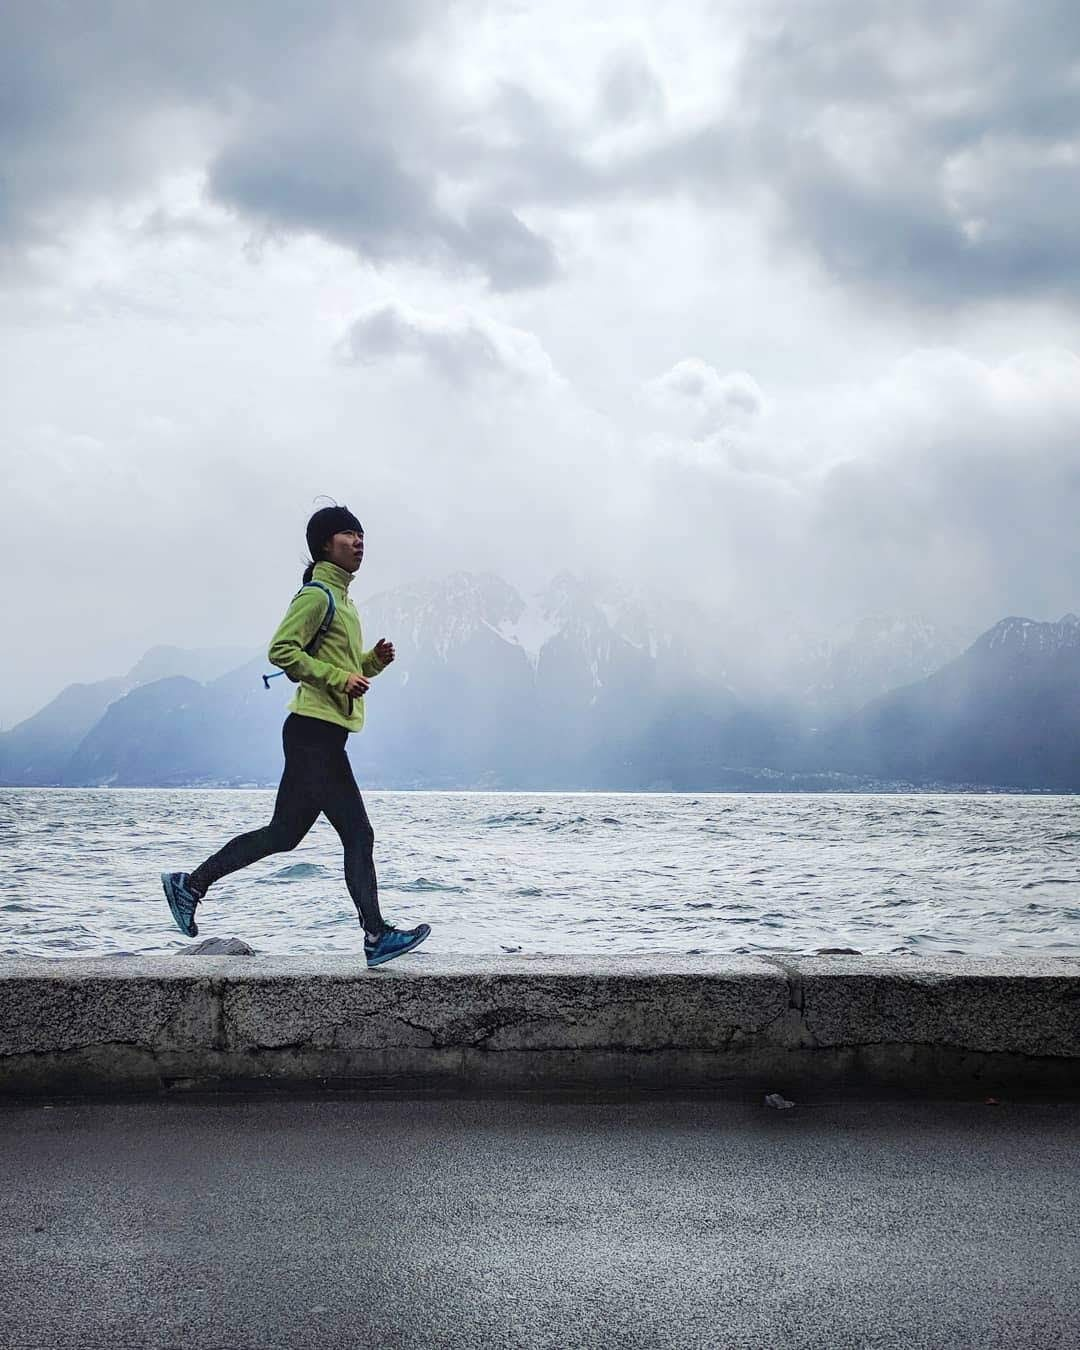 Triathlon Training for a Marathon: My Experience | imperfect idealist #running #marathon #triathlon